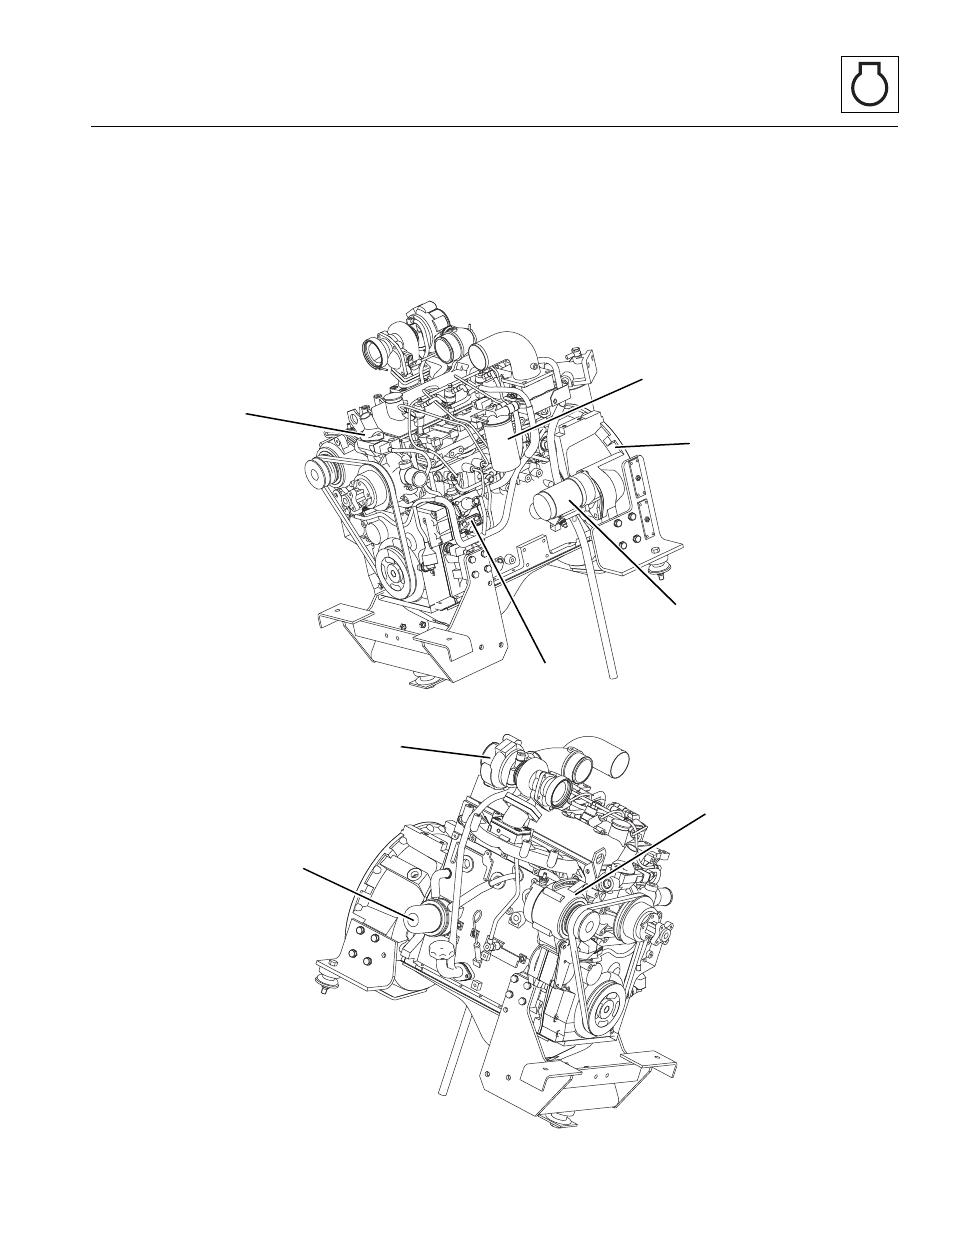 Component terminology - cummins - qsb3.3t/qsb4.5t | SkyTrak 8042 Service  Manual User Manual | Page 135 / 230